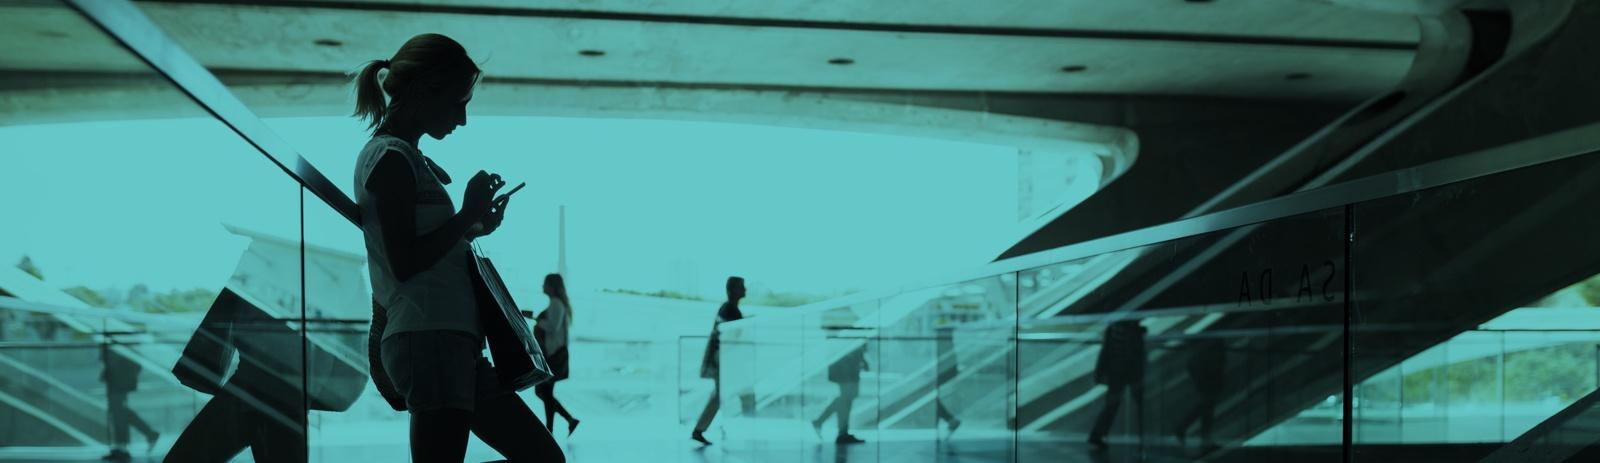 PILLAR-Woman-mobile-ext-1600x463px.jpg